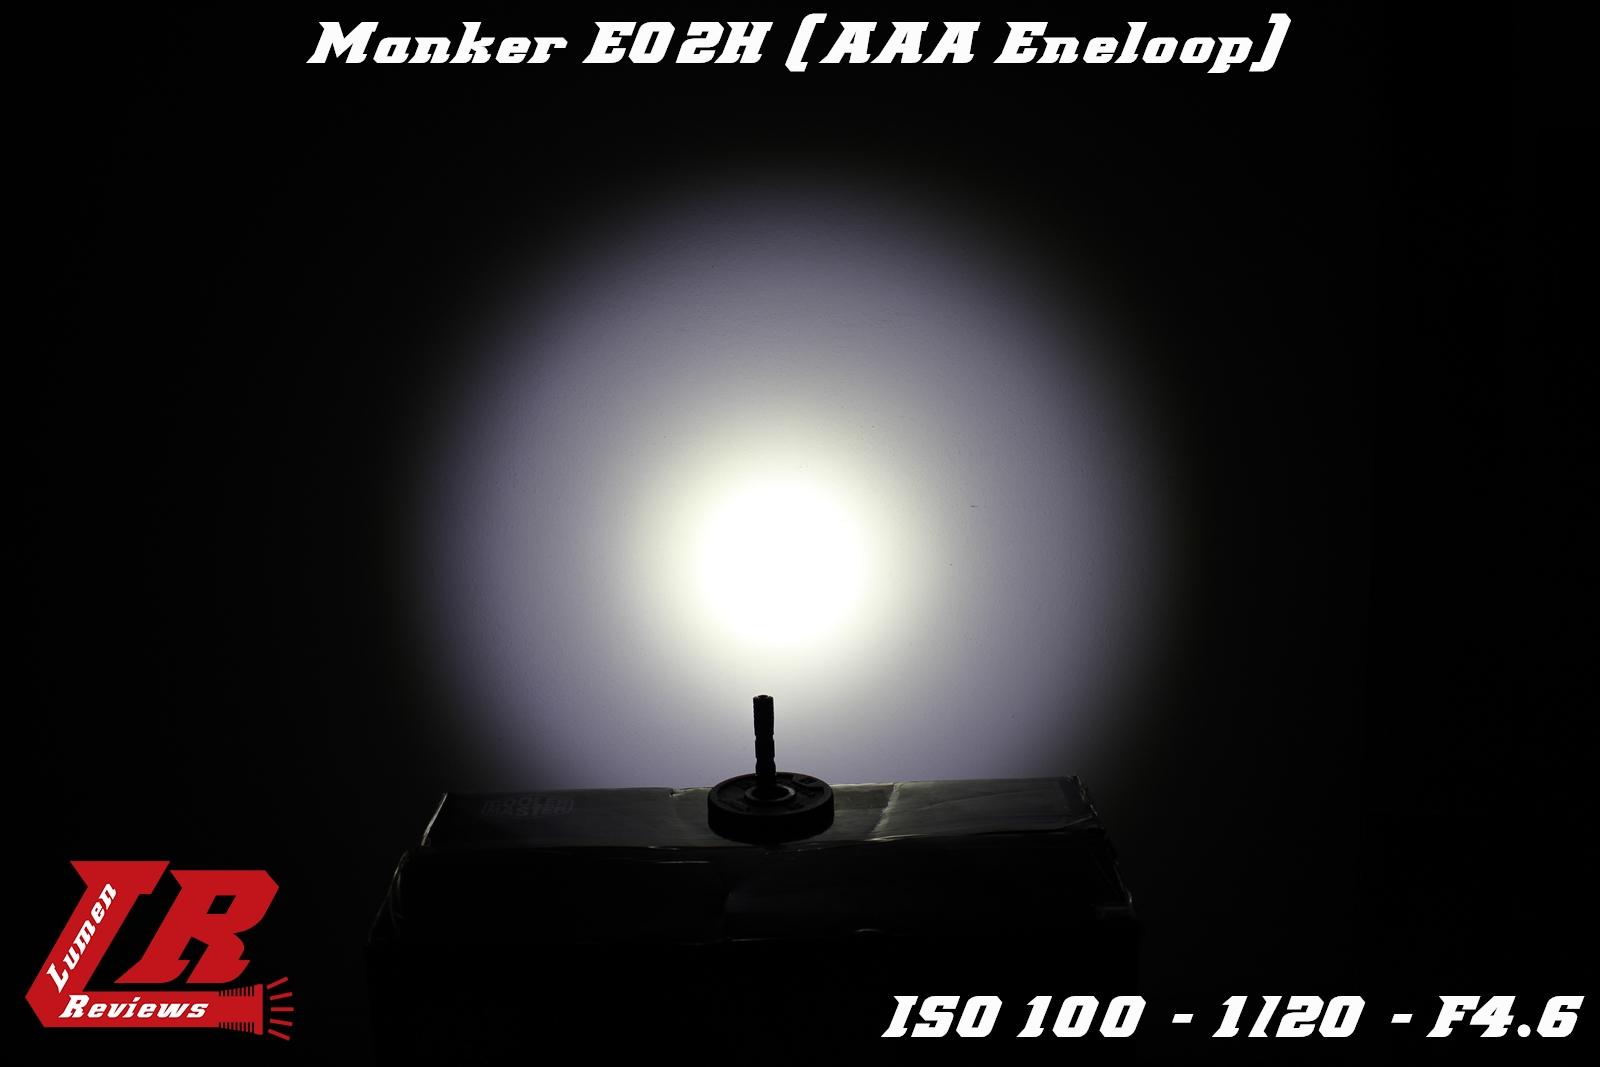 Manker E02H Beamshot 1